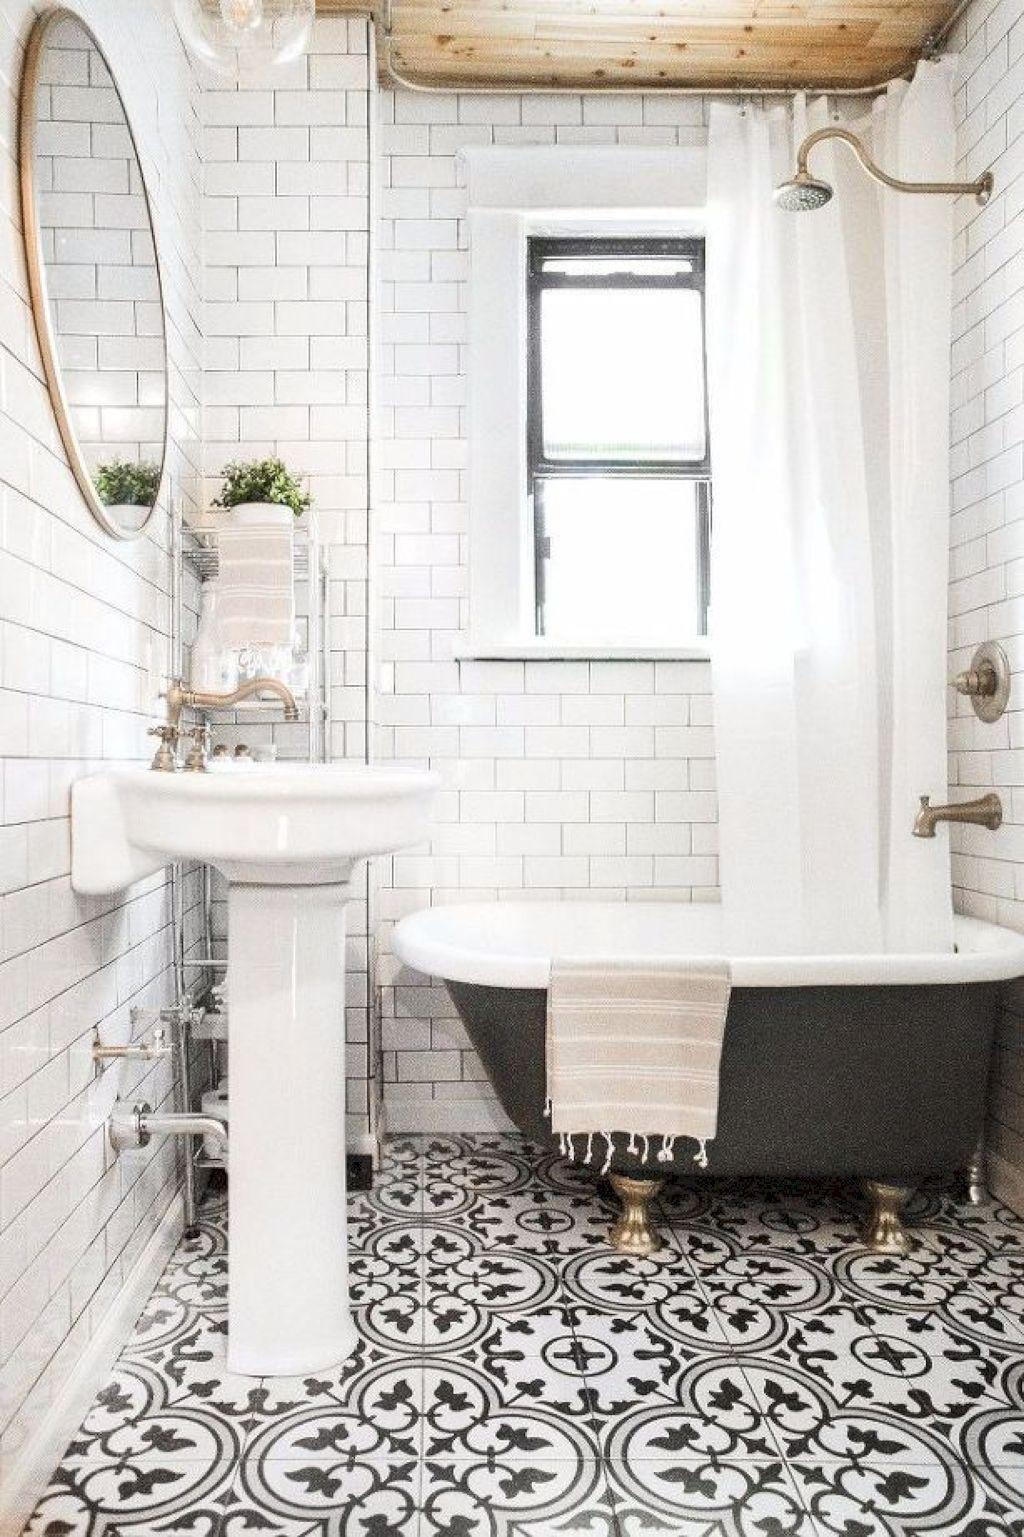 Small Bathroom Ideas 52 Black White Bathrooms Bathroom Trends Small Bathroom Remodel